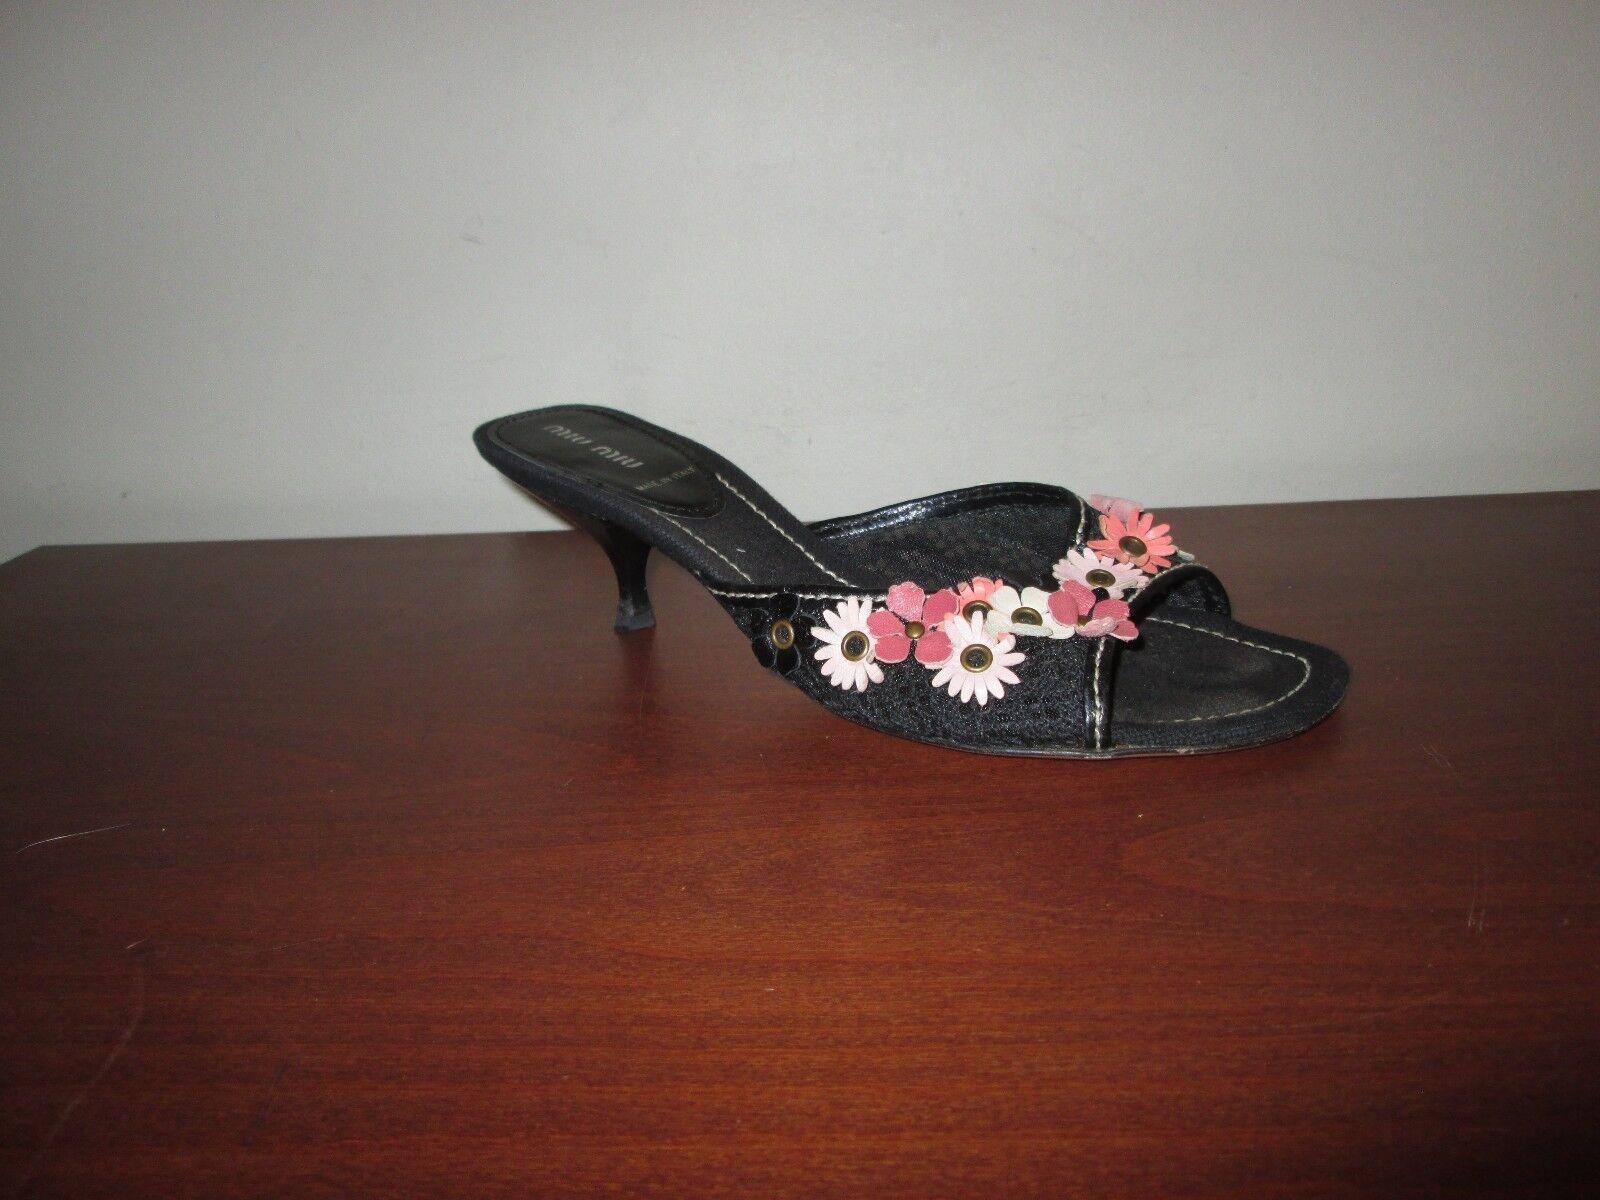 MIU MIU Black Mesh Leather Flower Embellished Kitten Heel Mules Sandals 39